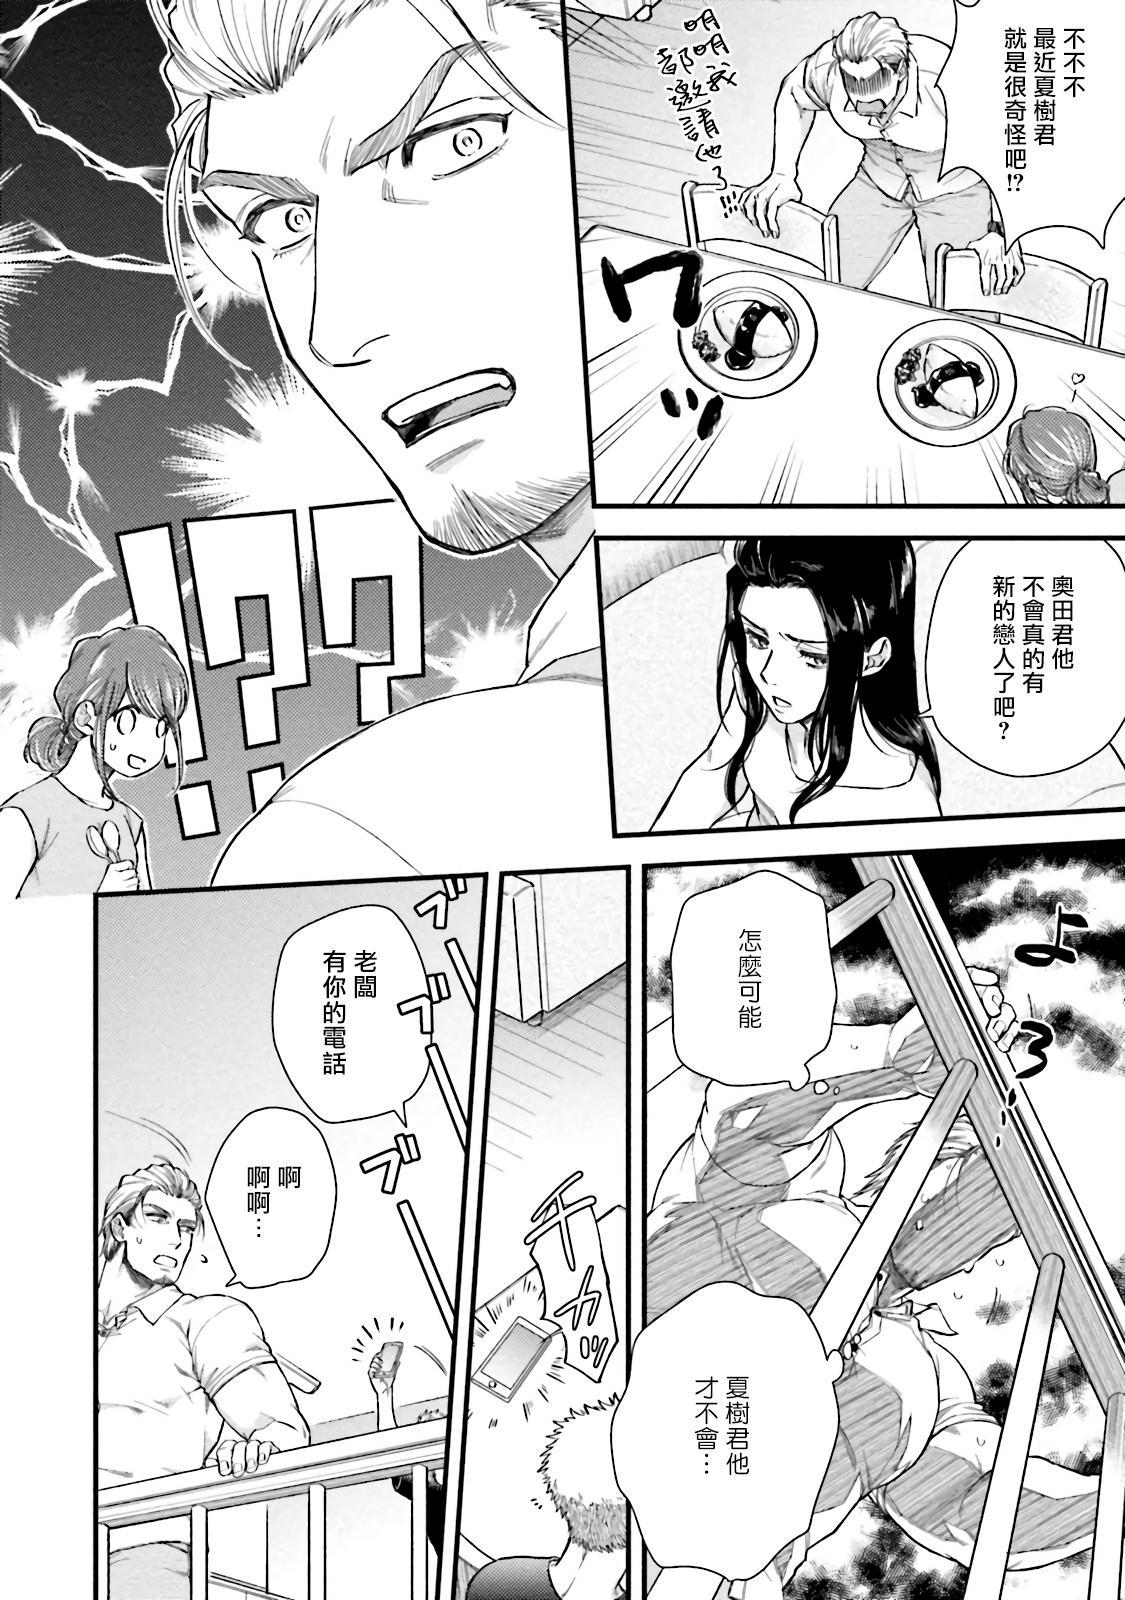 Kinou wa Otanoshimi Deshita ne | 昨天过得很愉快吧 Ch. 1-4+特典 60